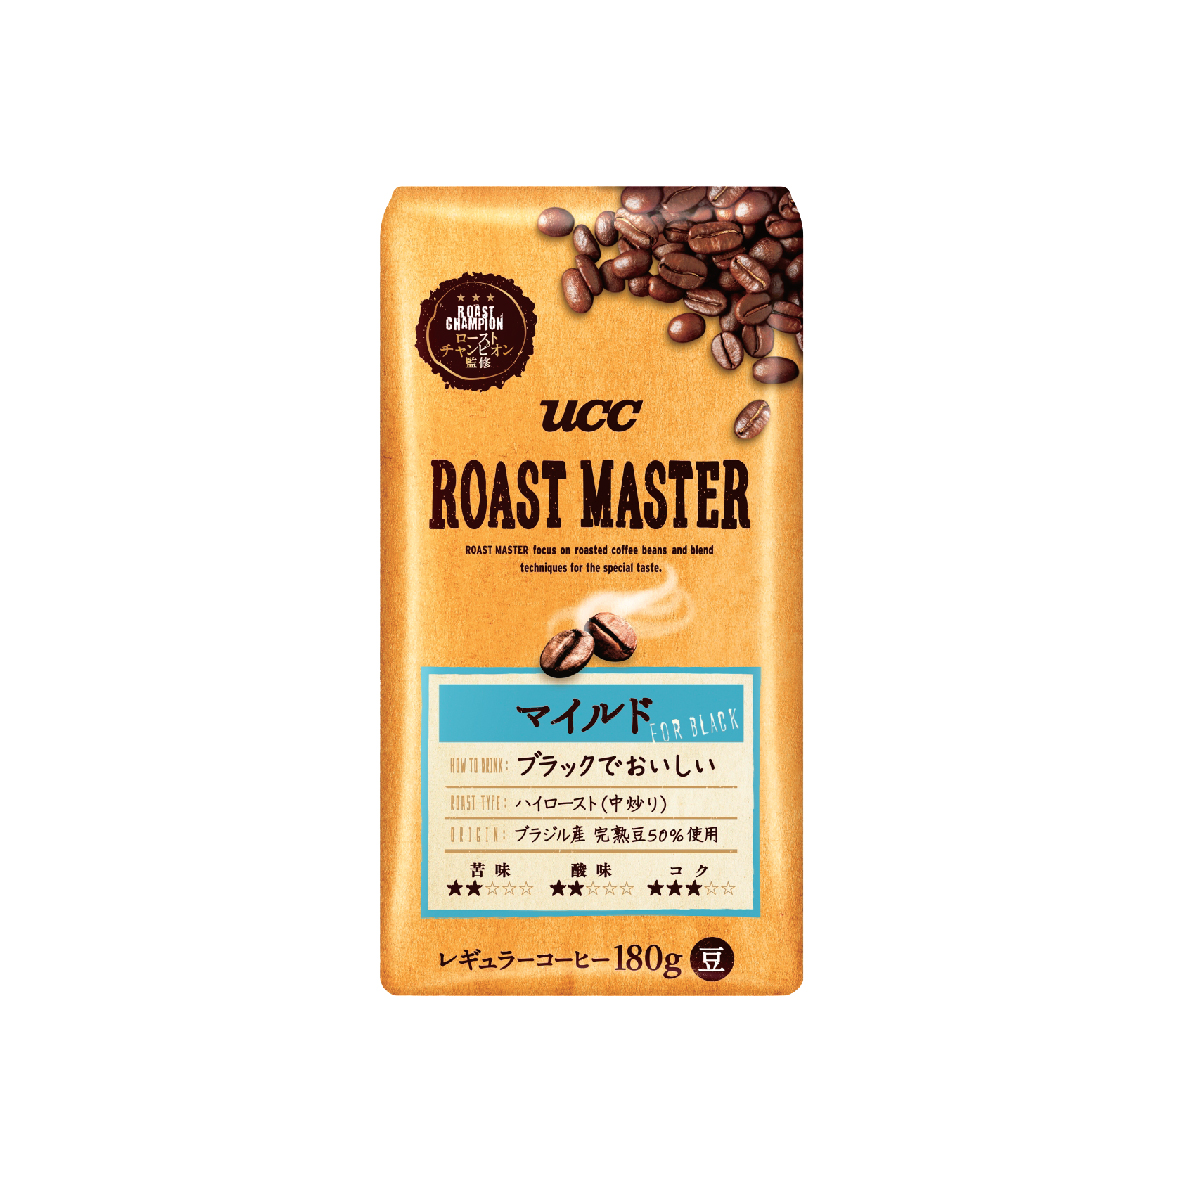 UCC Roast Master Mild Coffee Blend Roasted Coffee Beans